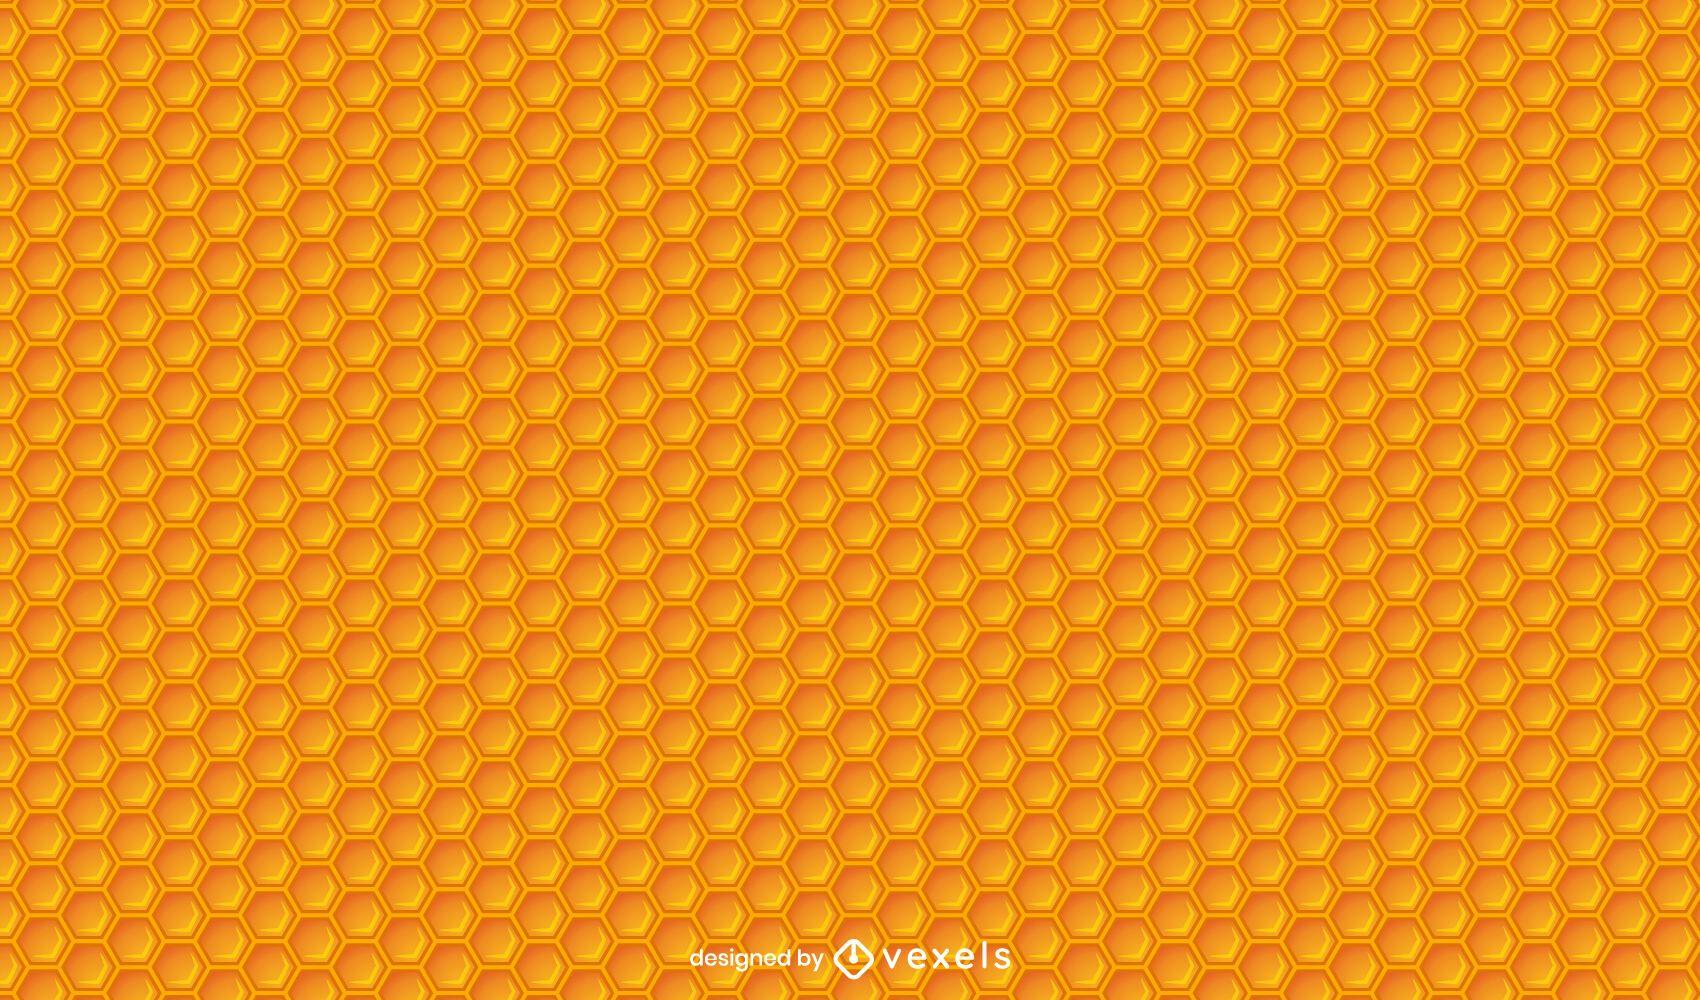 Bee honeycomb pattern design